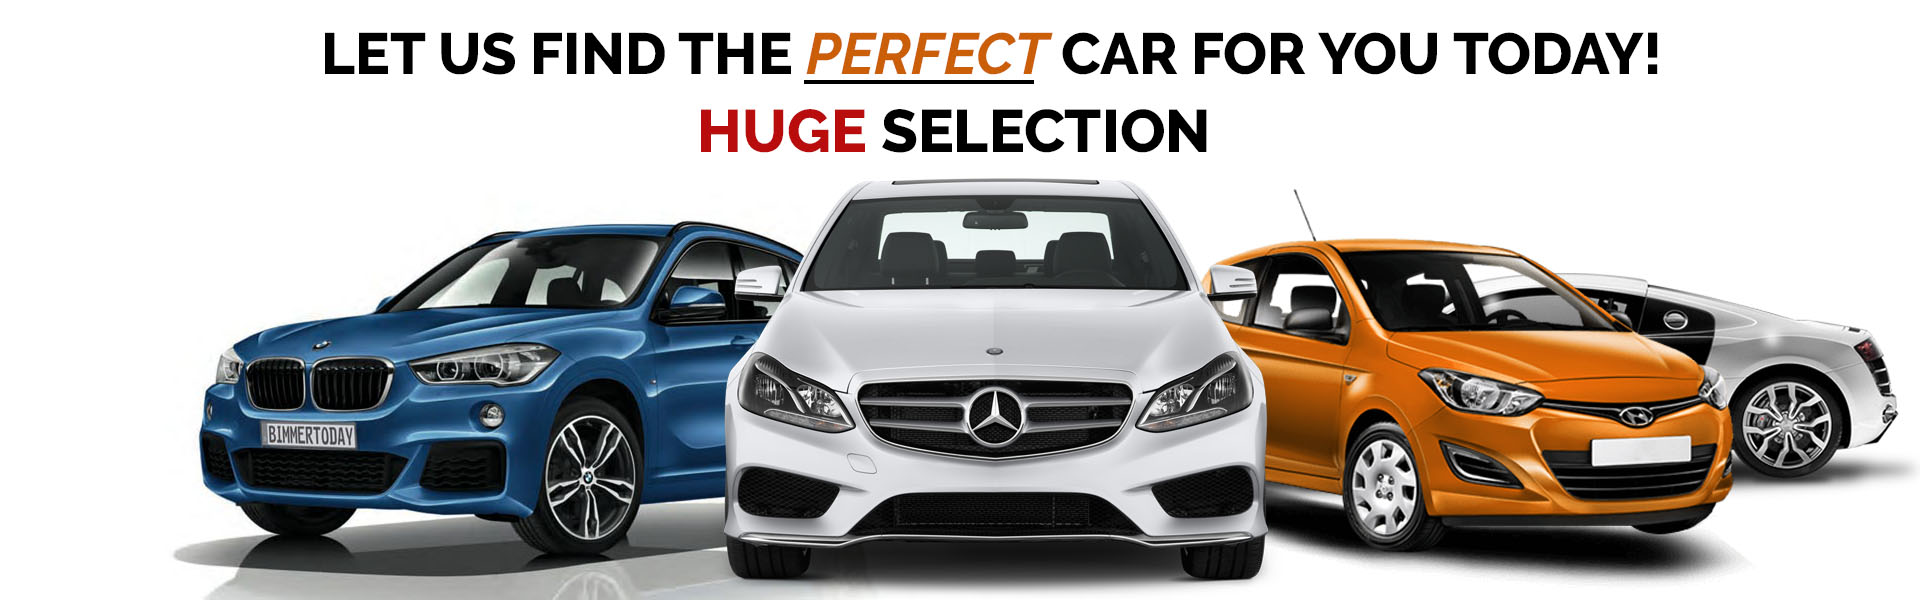 Buy Car Usa >> Afialink Buy Cars In Usa